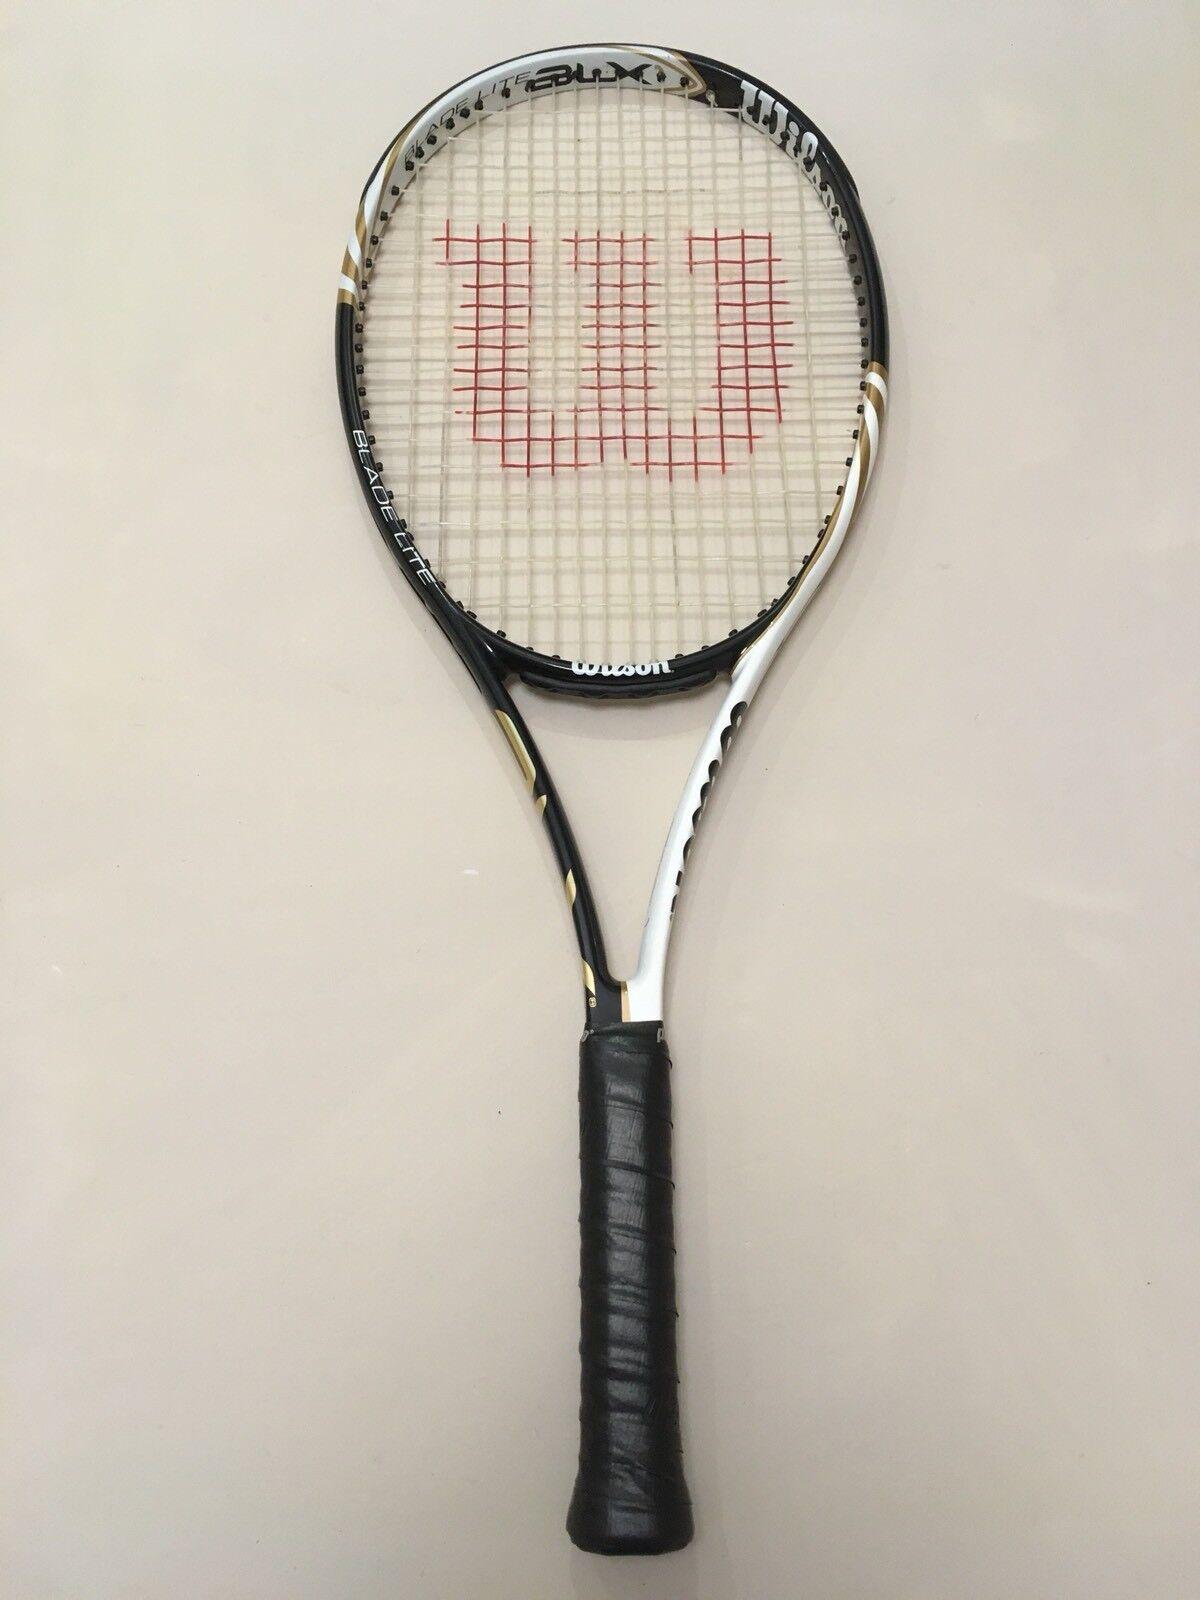 WILSON BLX BLADE LITE 100 16x20 272 Racchetta  Tennis Racket  precios al por mayor